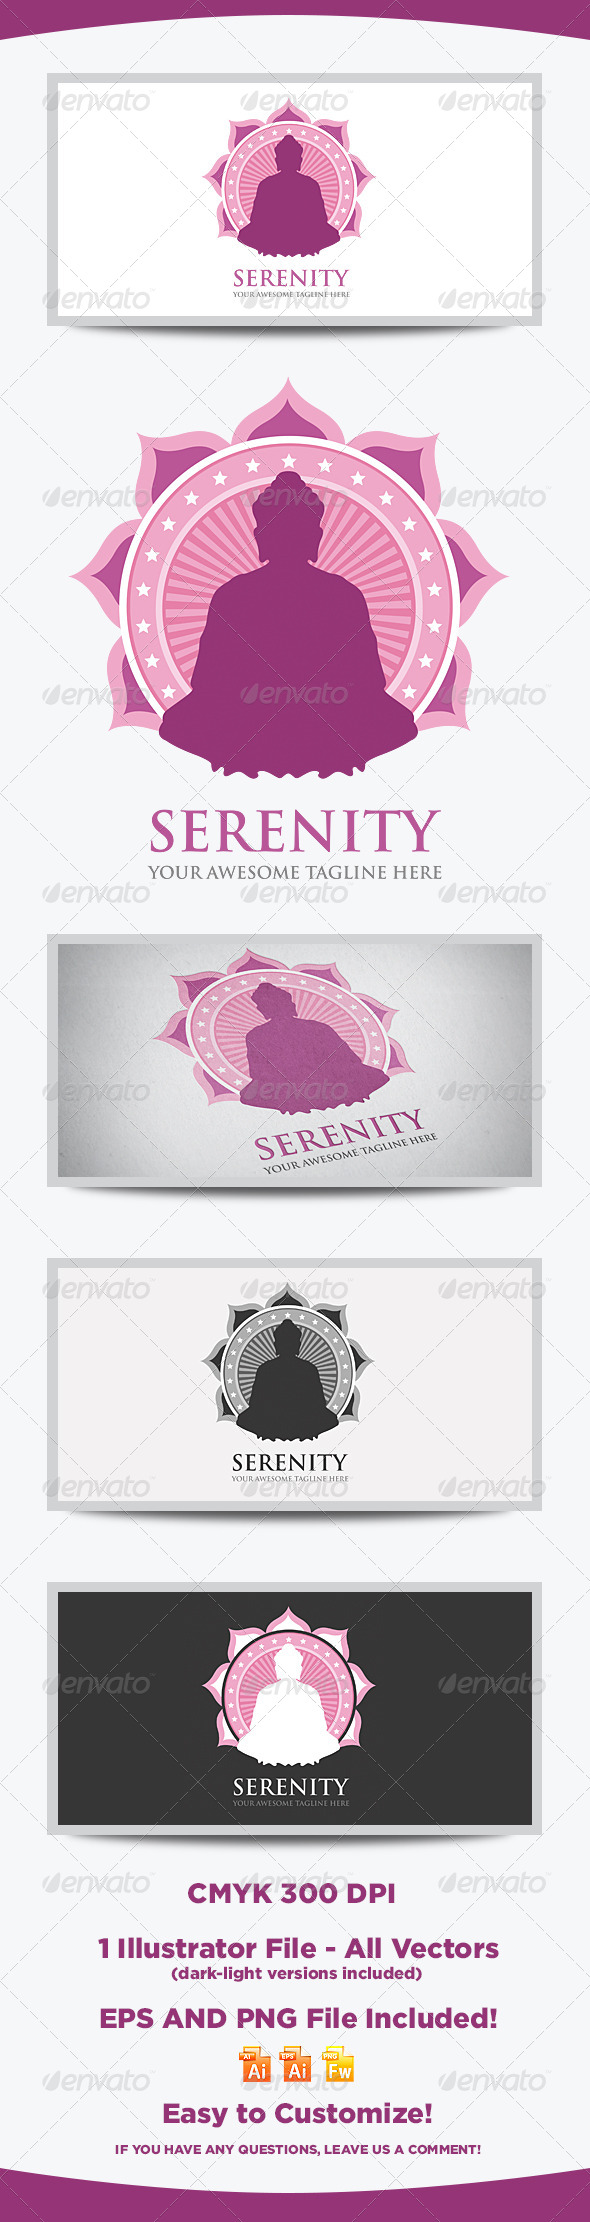 Serenity Logo Template - Logo Templates